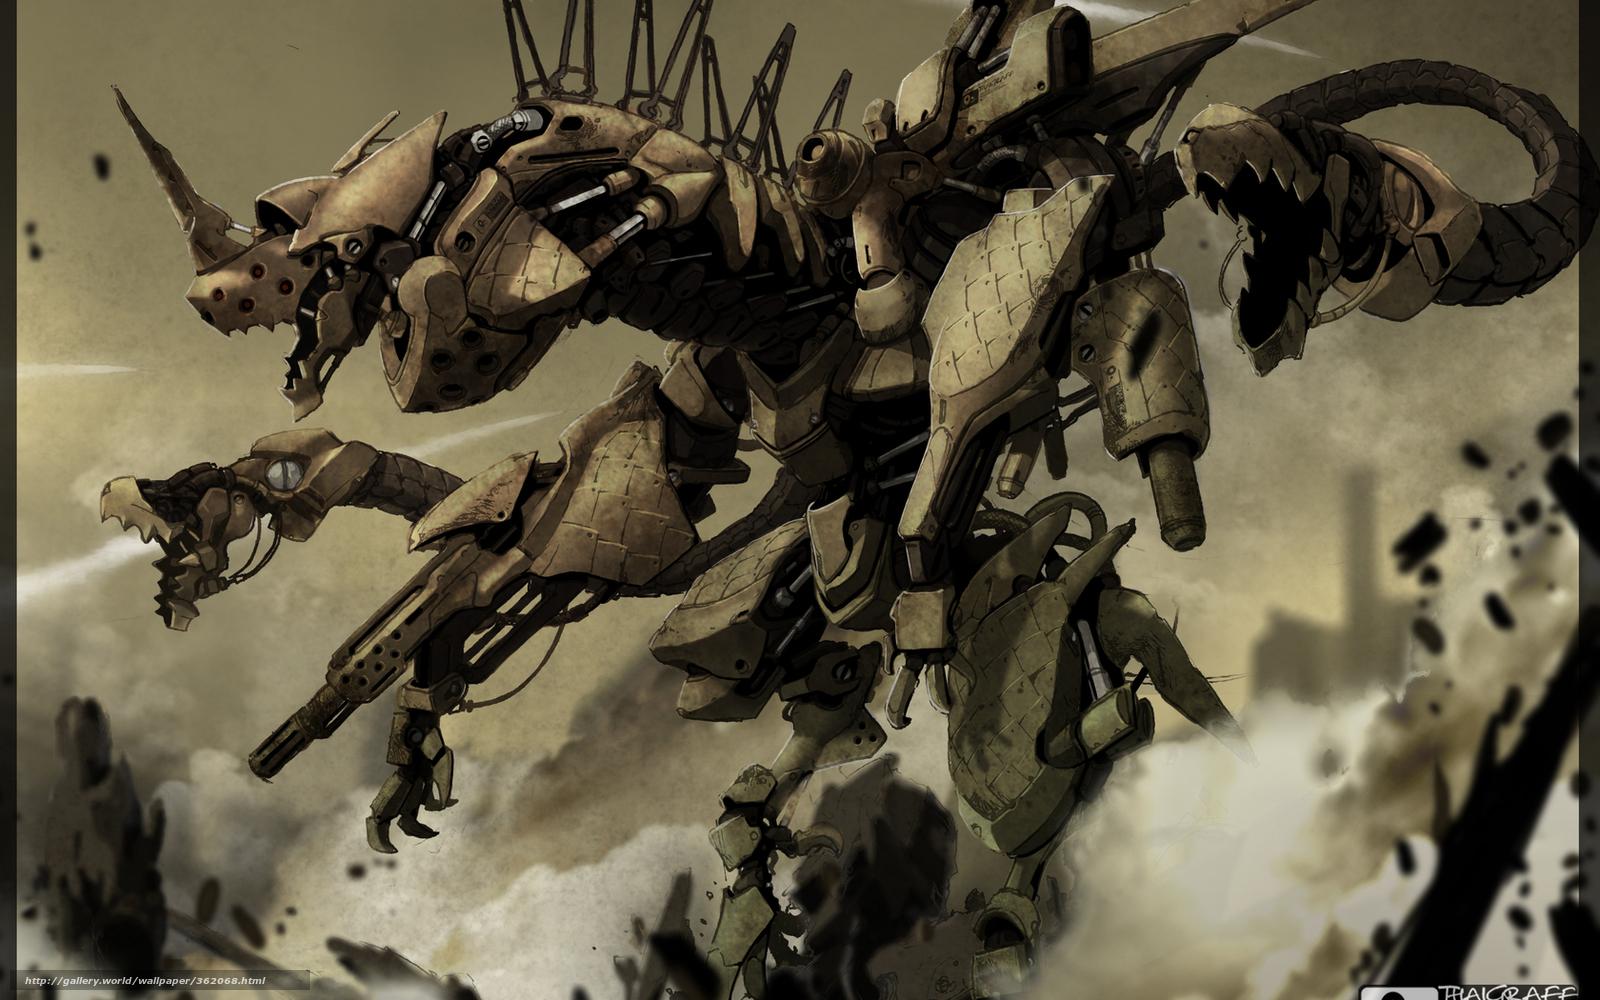 Robotic Military Drones : 絵 無料 : 無料